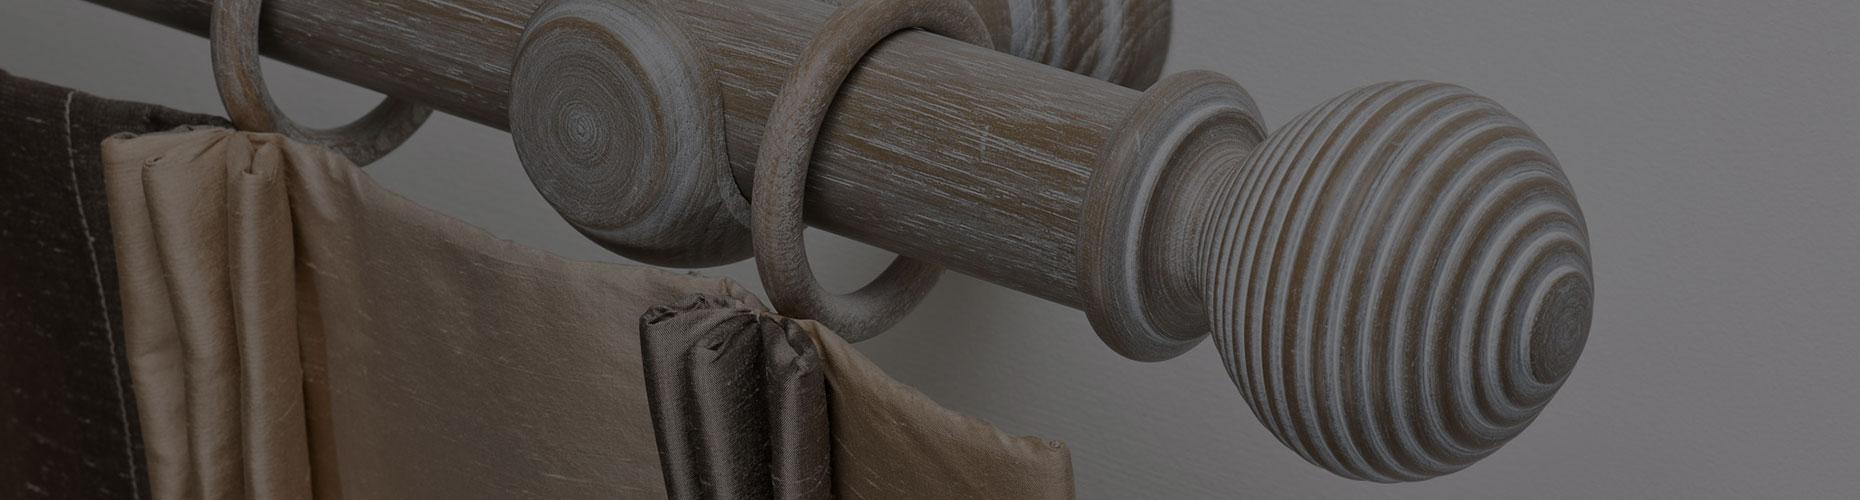 Curtain Poles, Tracks & Trims